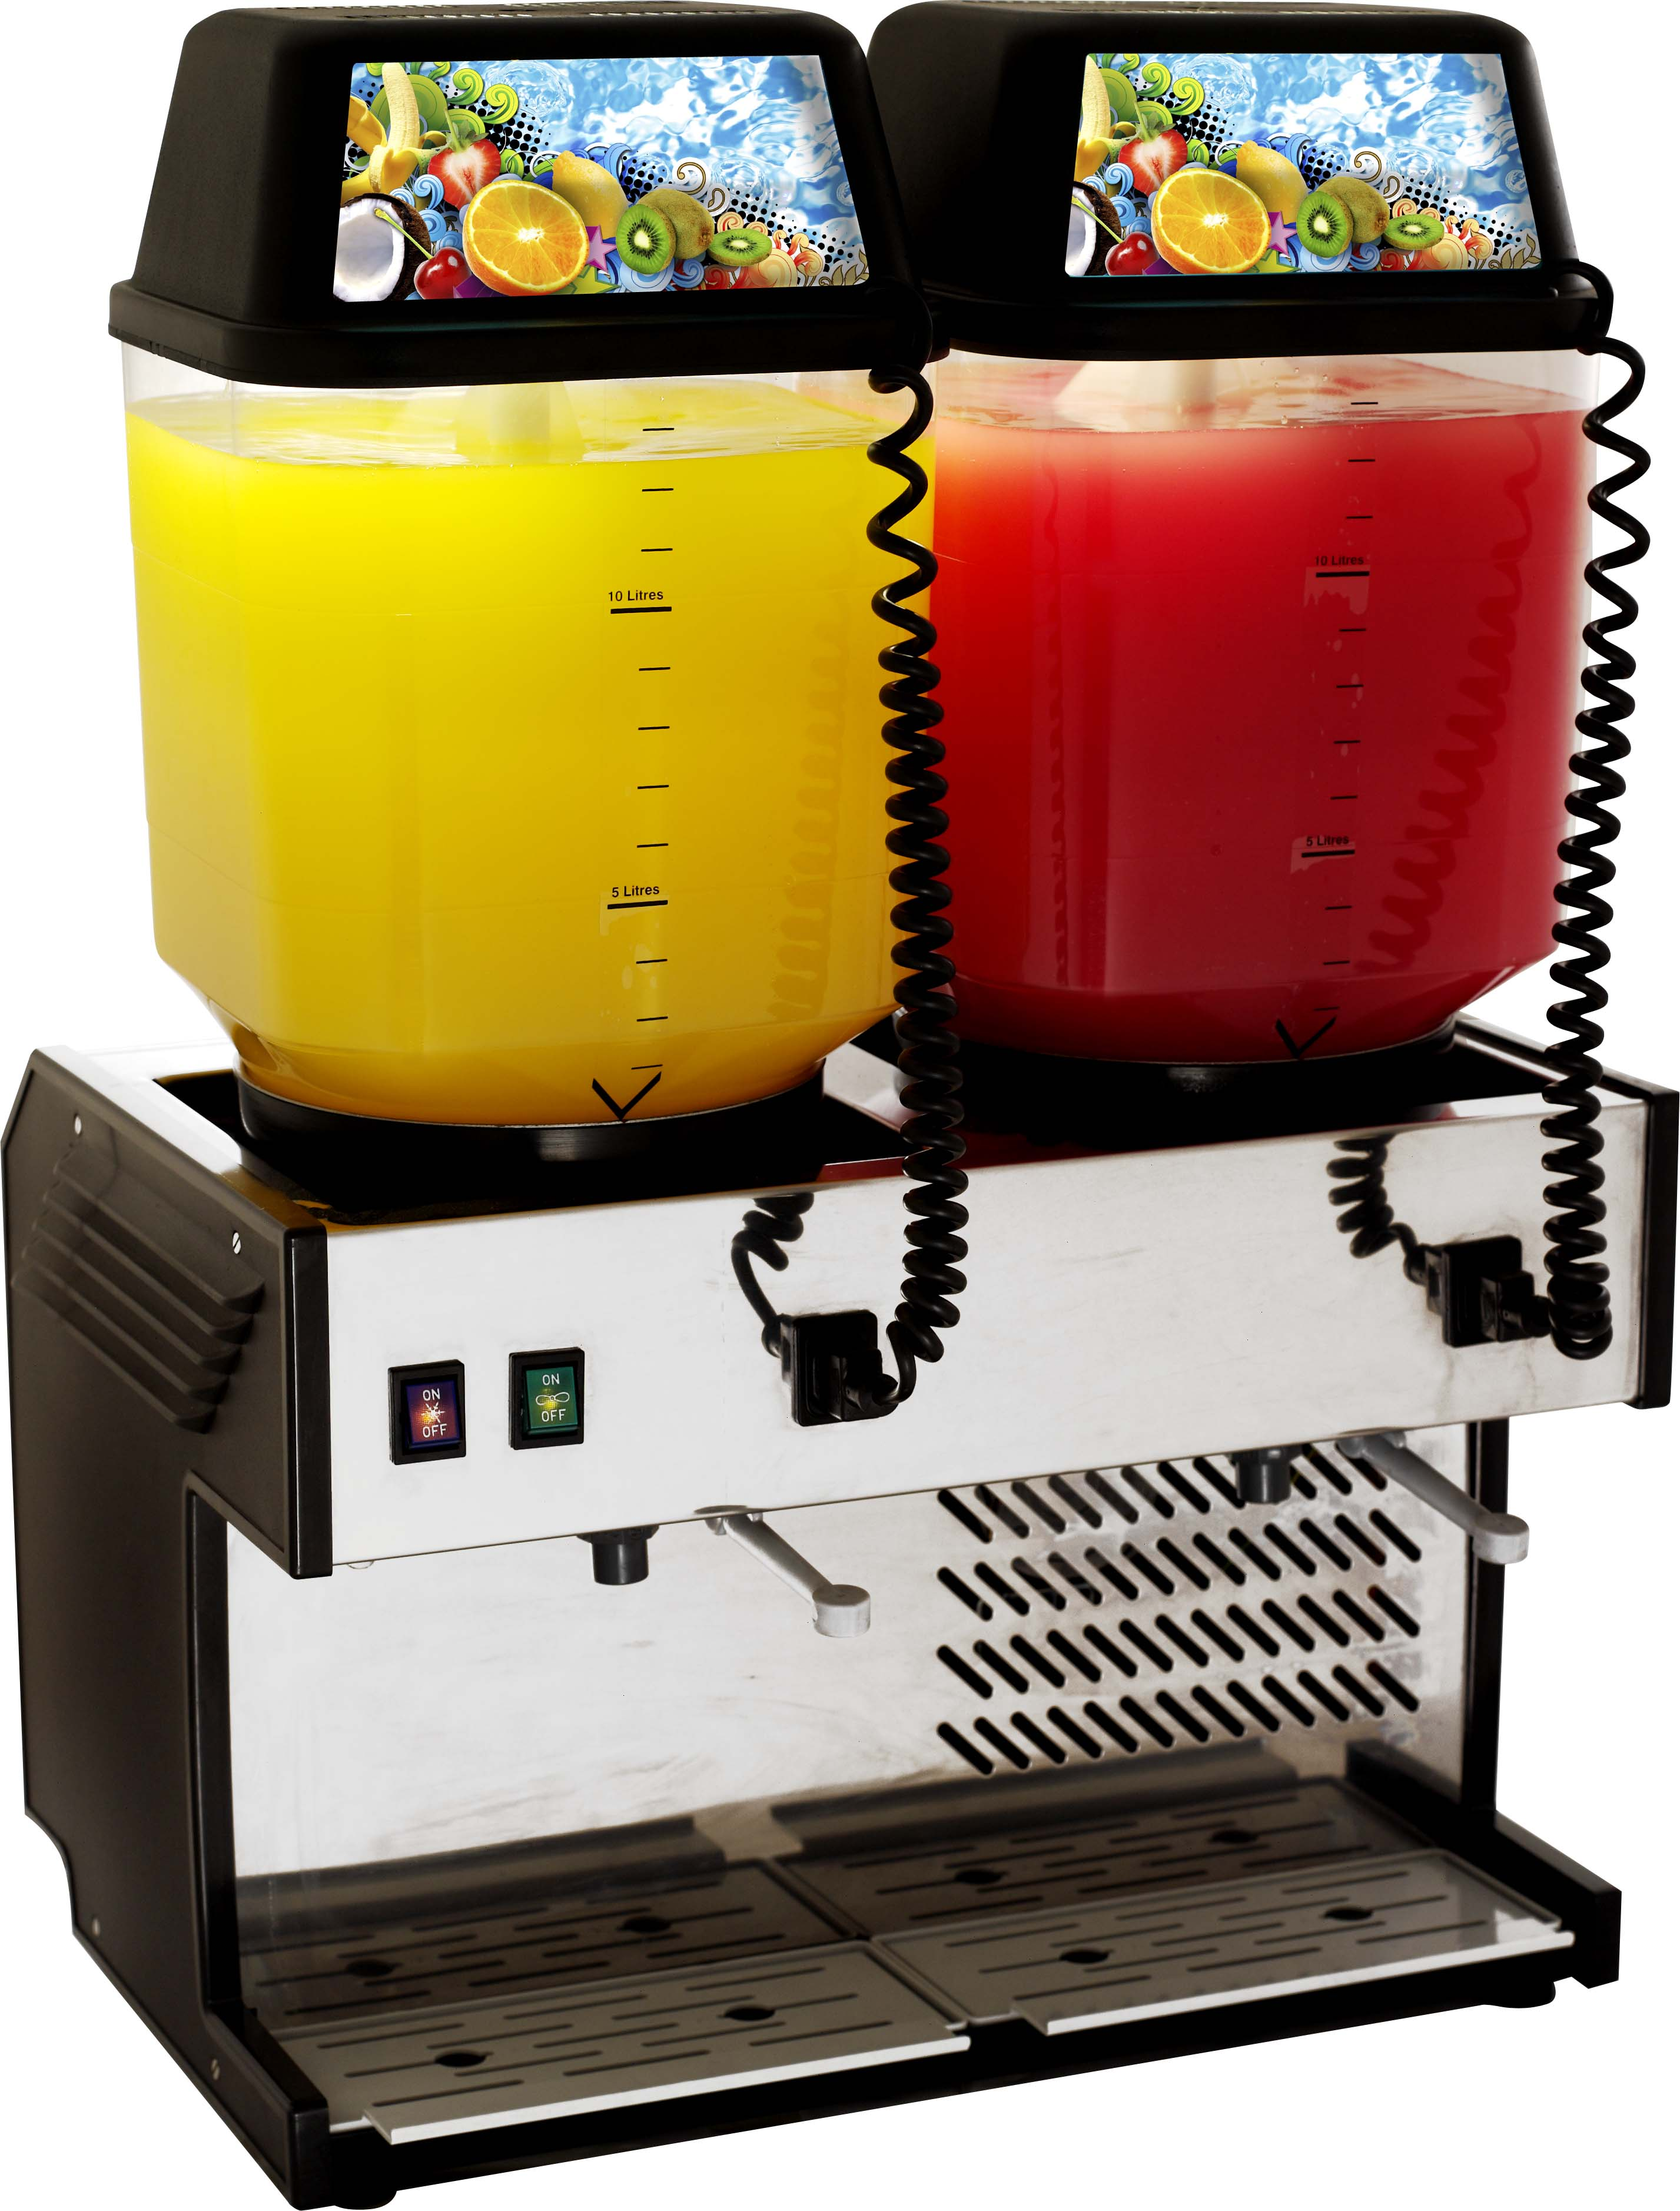 jda2002--summit-refrigerated-juice-dispencer--2-bowl